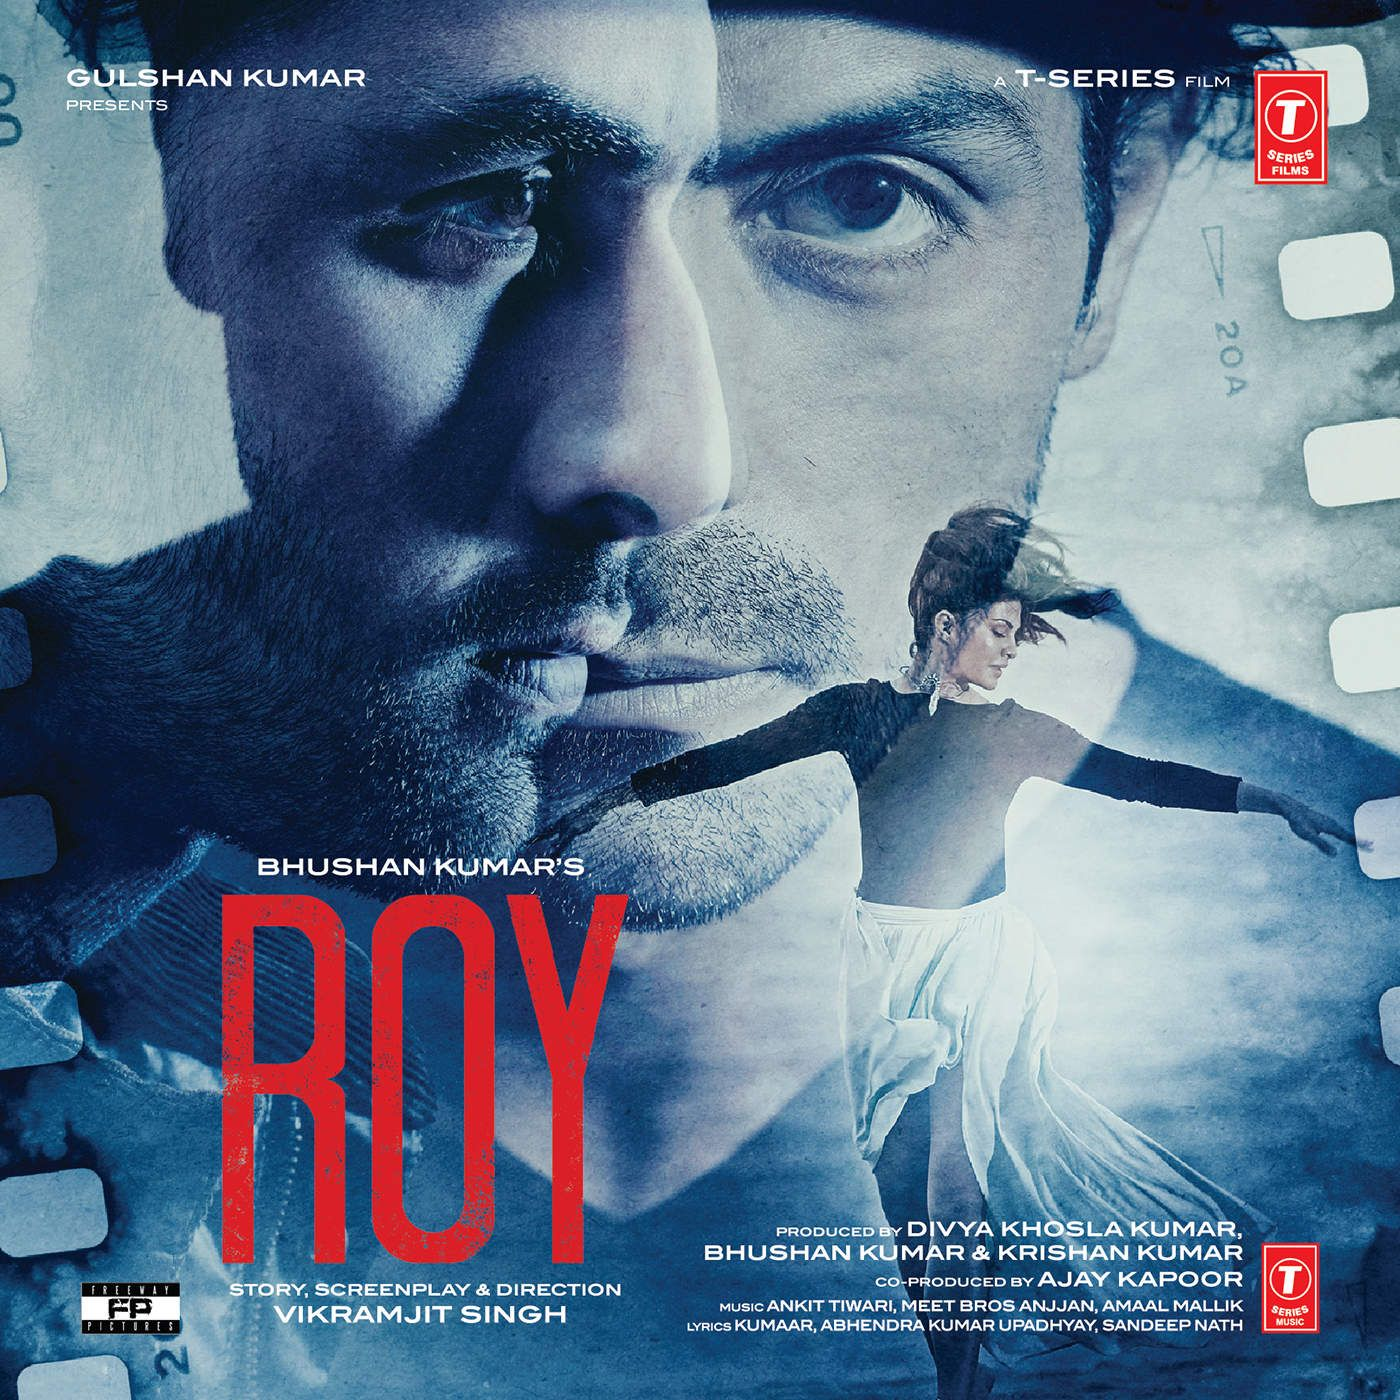 Roy (2015) Movie Mp3 Songs. | Bollywood music, Movie songs